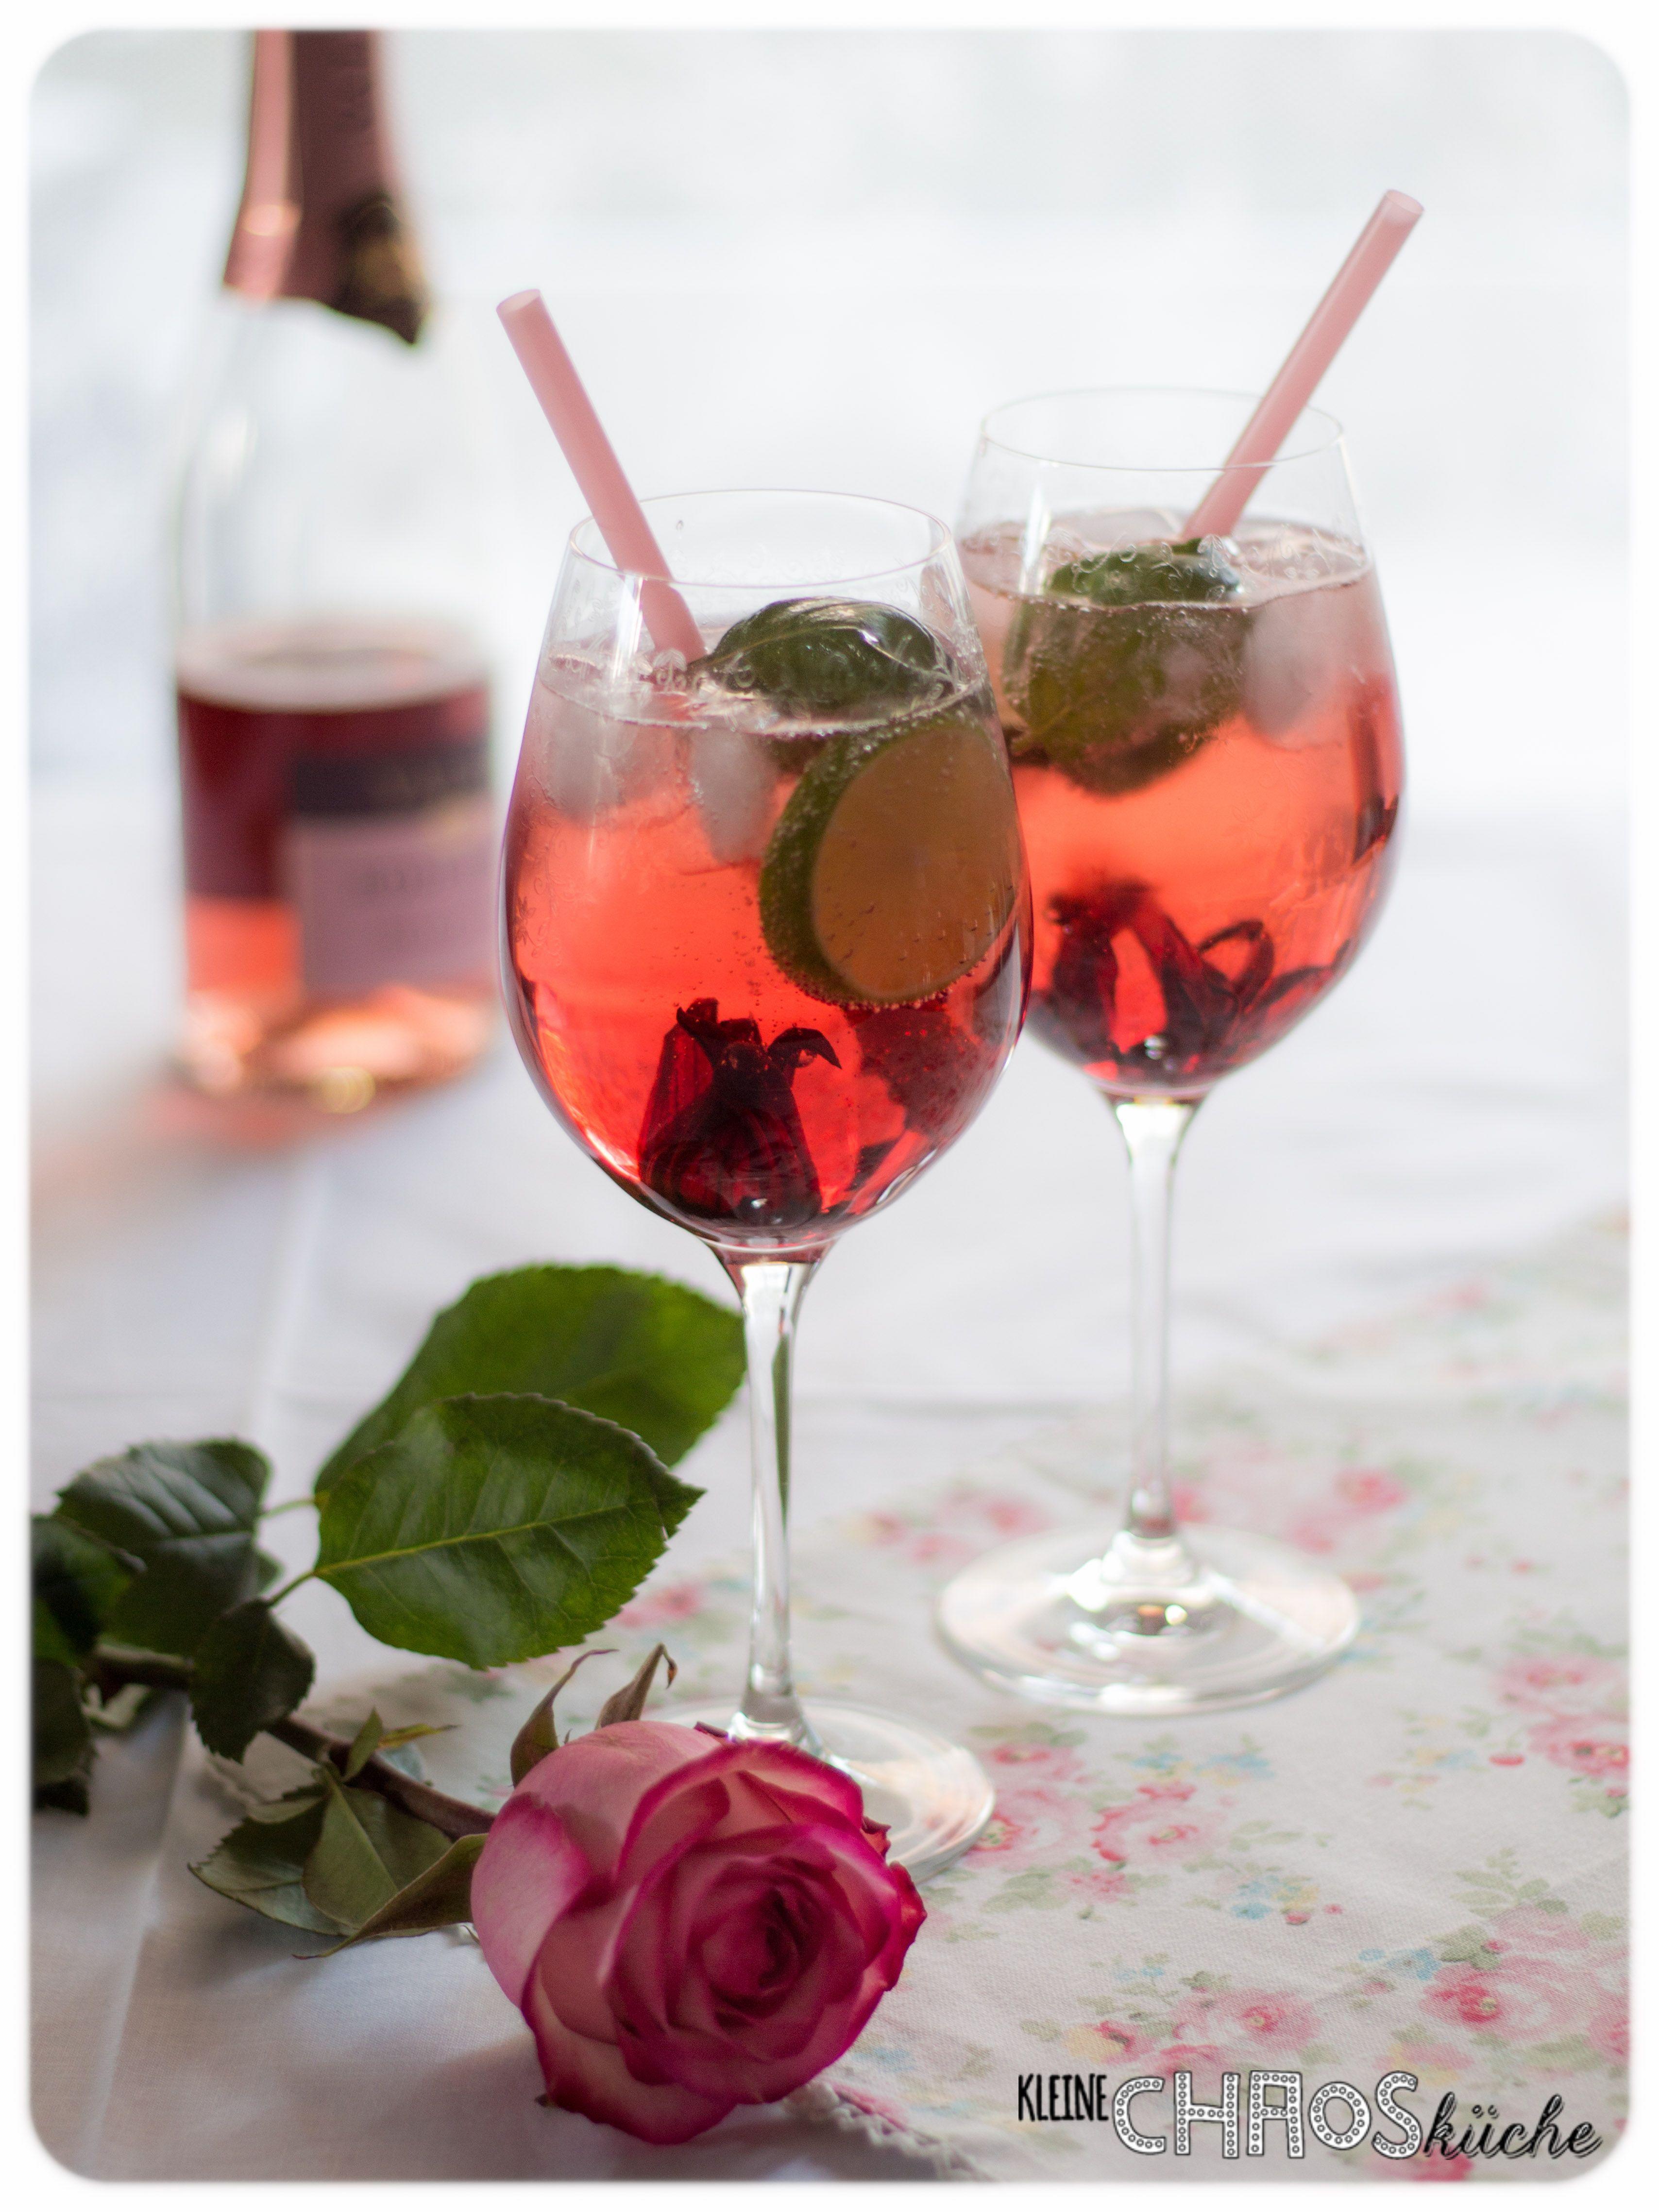 aperitif steirer spritz prosecco rose ramazzotti aperitivo rosato basilikum limette hibiskus. Black Bedroom Furniture Sets. Home Design Ideas